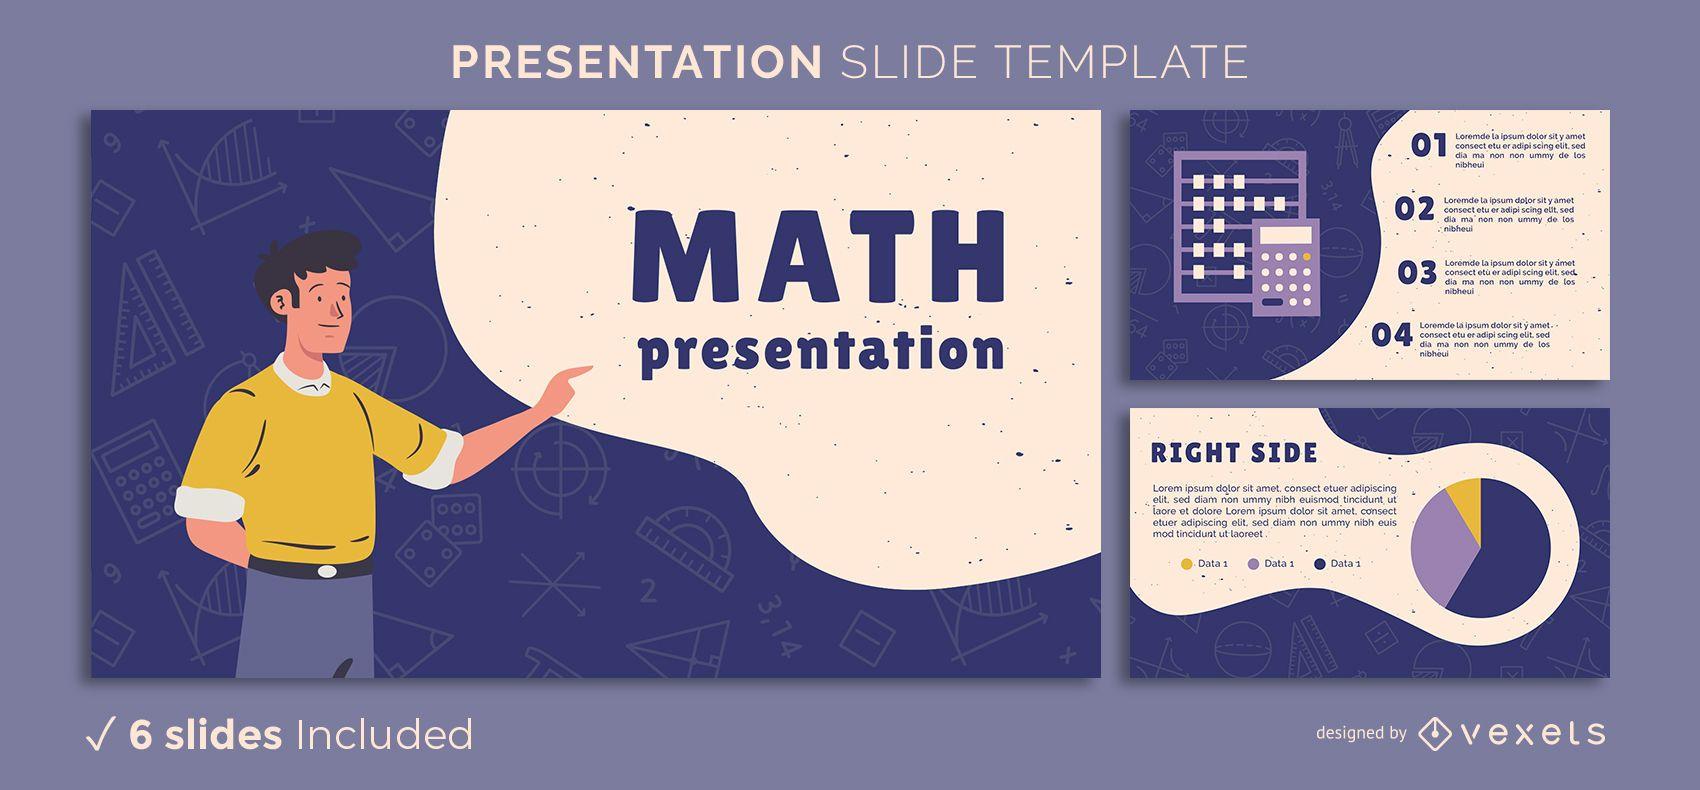 Math Presentation Template